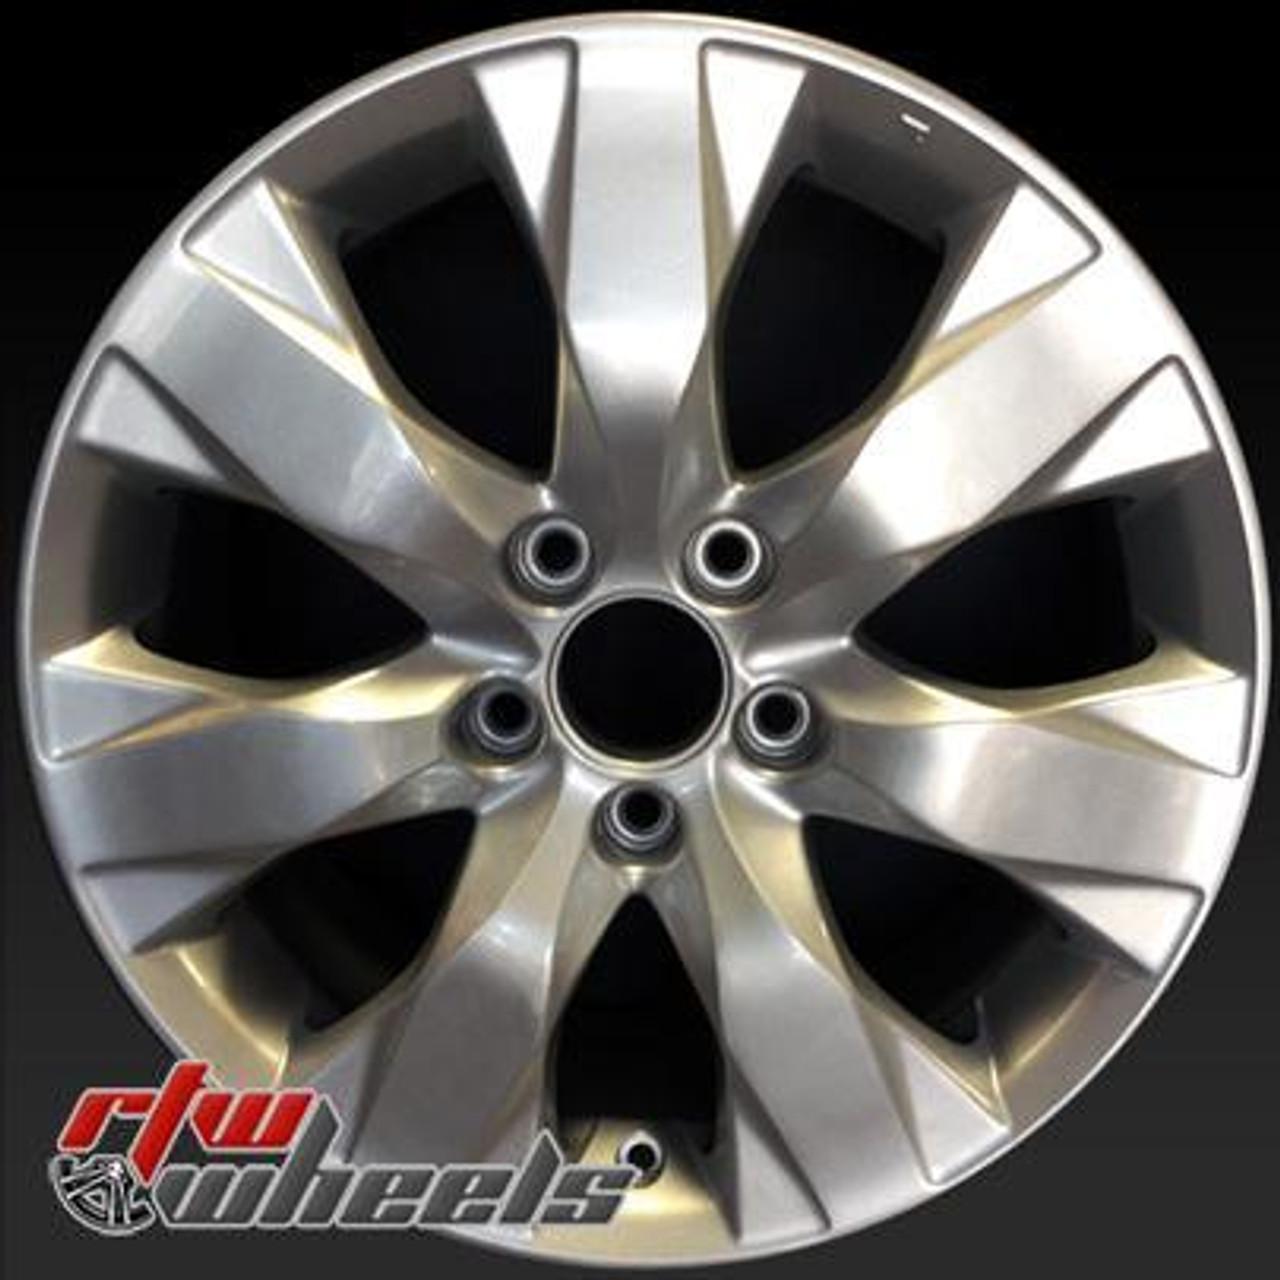 Honda Factory Rims >> Honda Accord Wheels For Sale 2008 2010 17 Silver Rims 63934